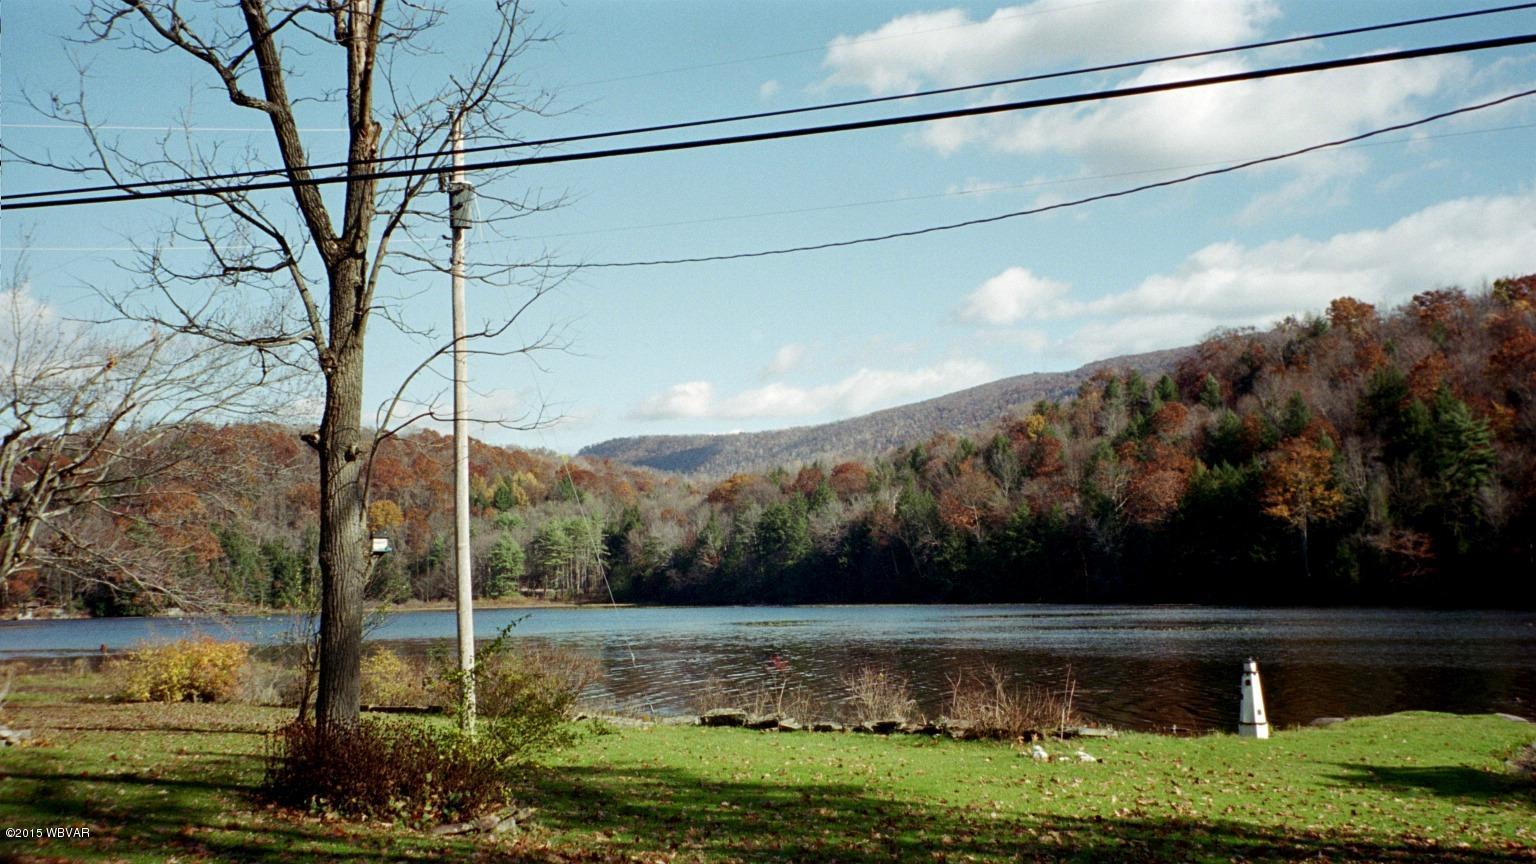 LOT 79 OAK LANE, Muncy Valley, PA 17758, ,Land,For sale,OAK,WB-76027